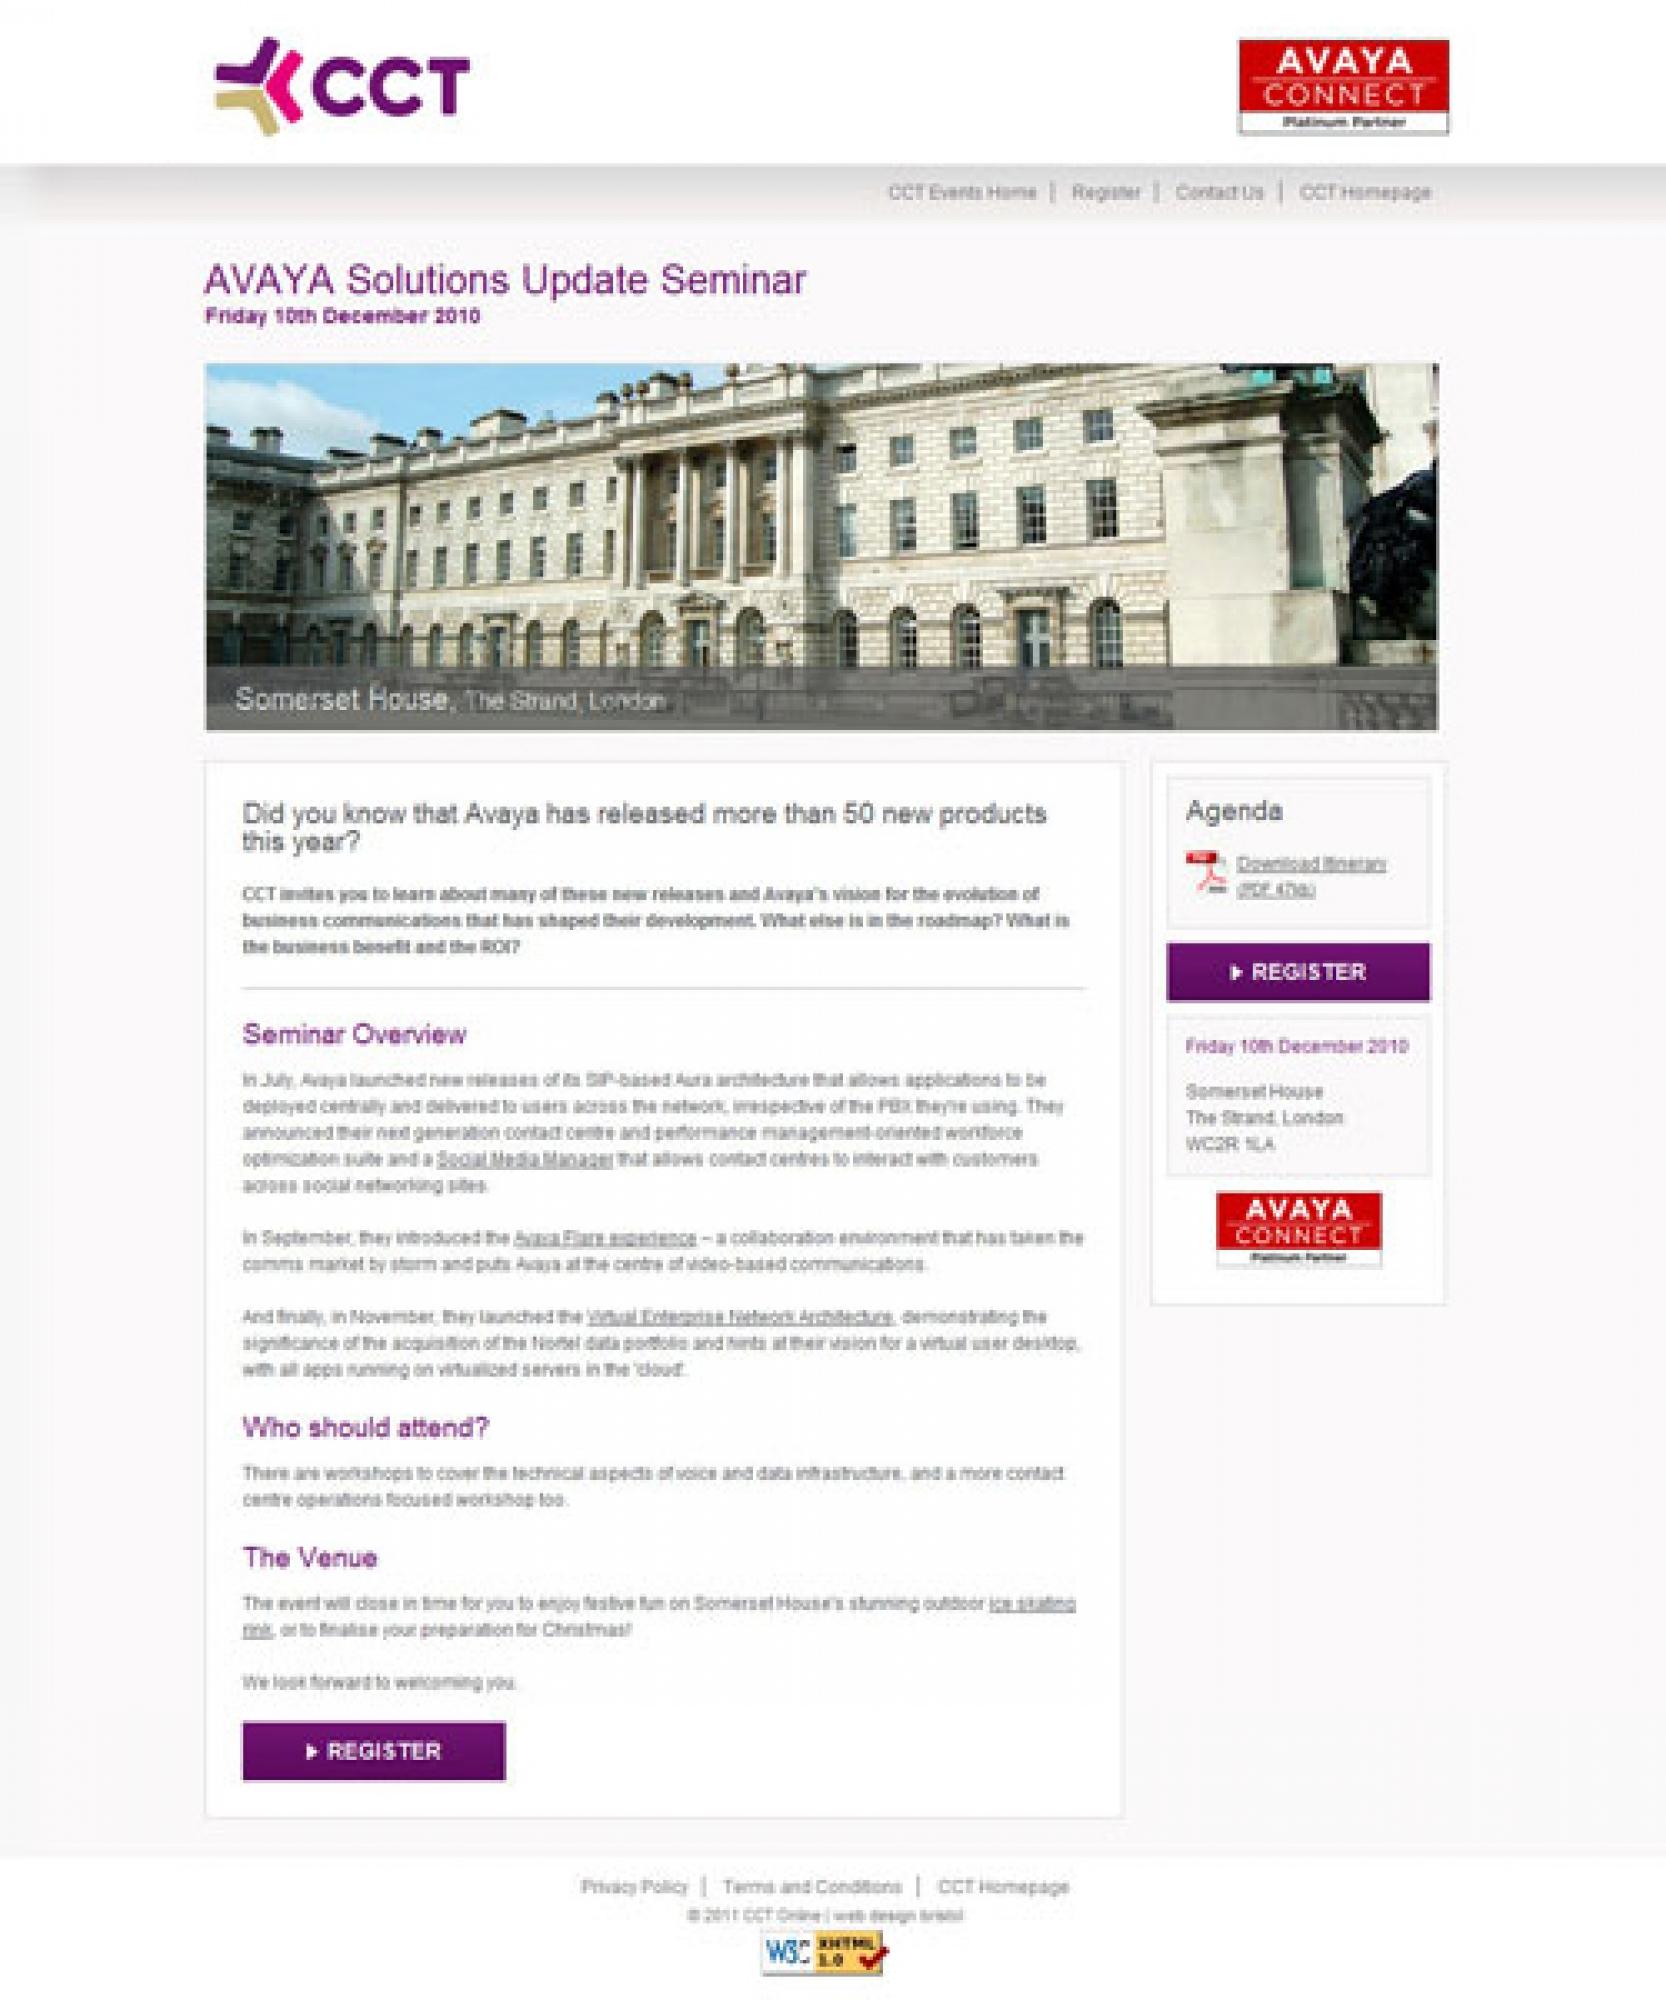 CCT and Avaya Screenshot